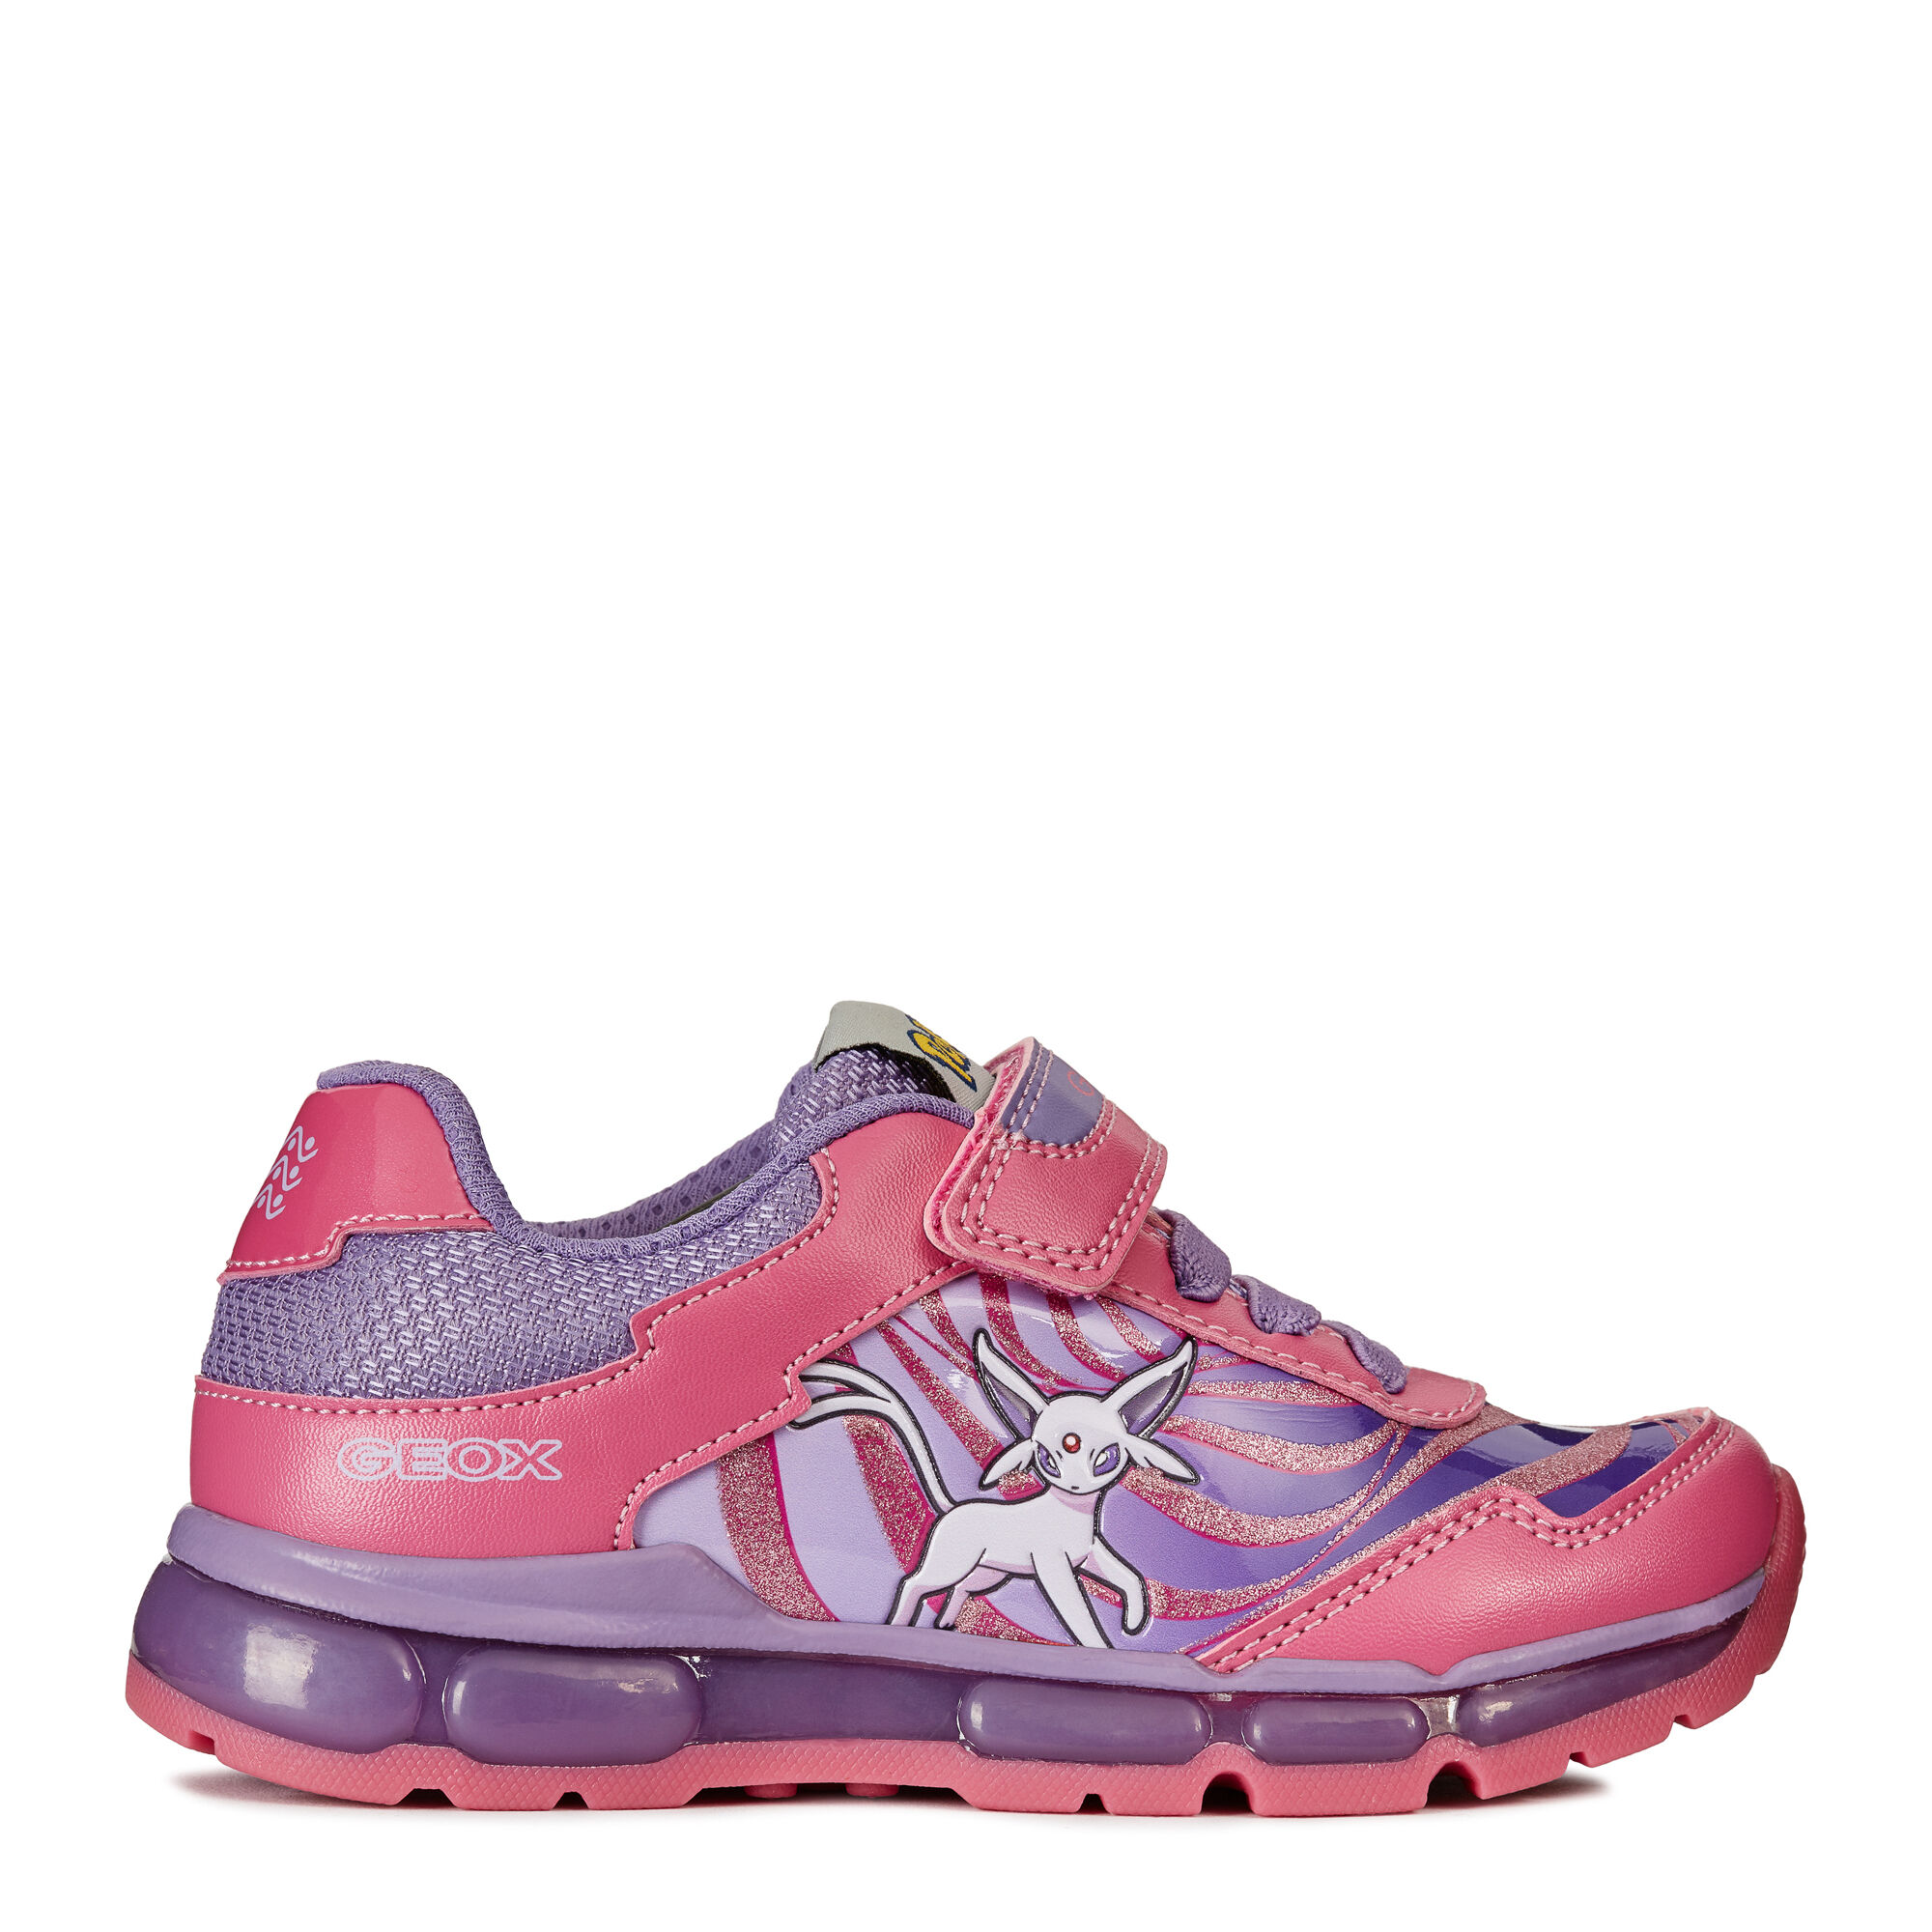 Android Zapatos Jr De Girl Oixgx8q Niña Led Geox 64wqn